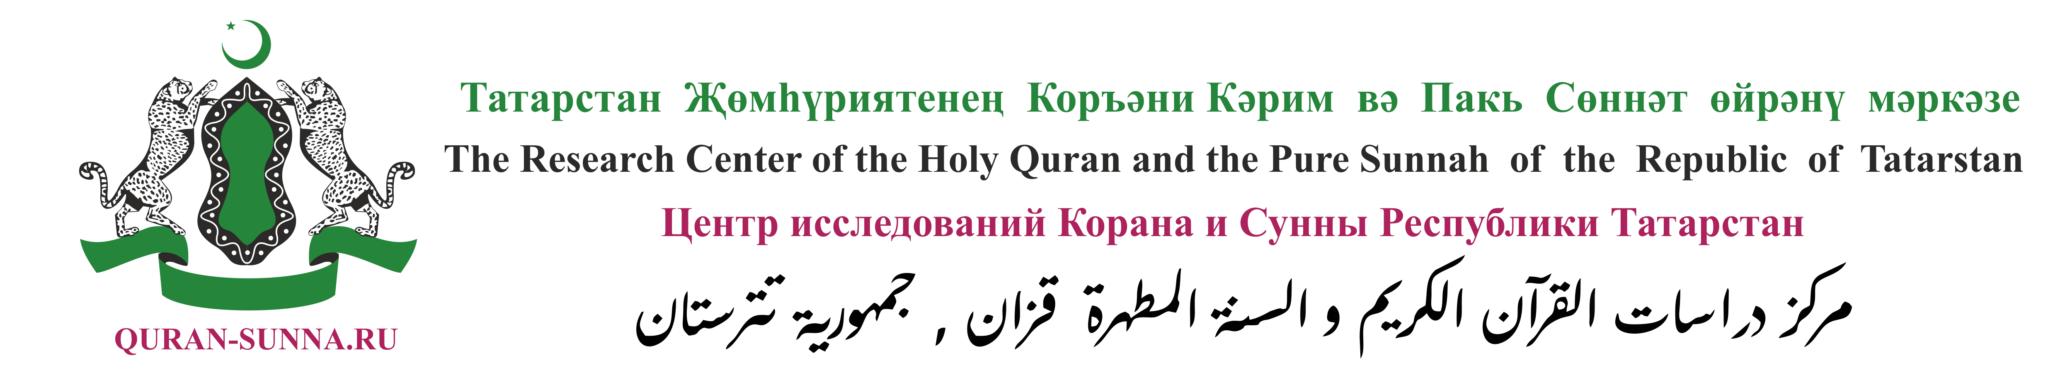 quran-sunna.ru